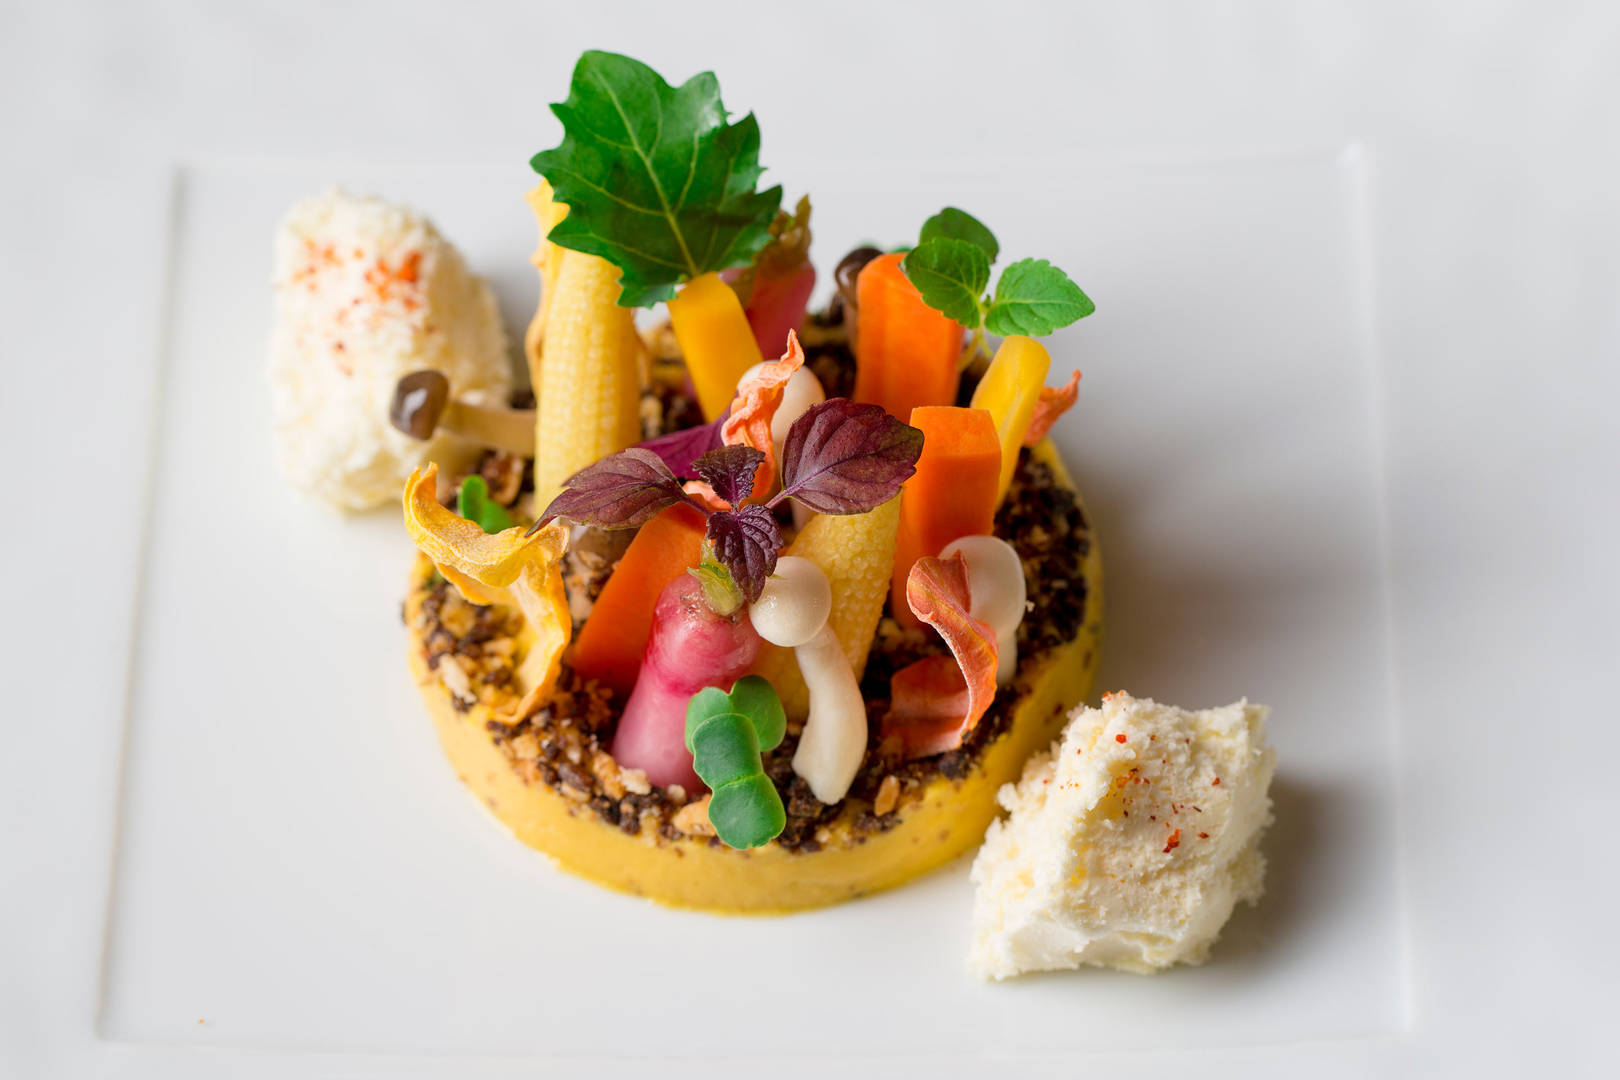 https://cdn.jumeirah.com/-/mediadh/DH/Hospitality/Jumeirah/Restaurants/Frankfurt/Frankfurt-Max-On-One-Grill-Room/Restaurant-Gallery/Jumeirah-Frankfurt-Max-on-One-Vegetables-with-Goat-Cheese_6-4.jpg?h=1080&w=1620&hash=30AAD9DCB96EF6D3E64D1328C62CE2B8